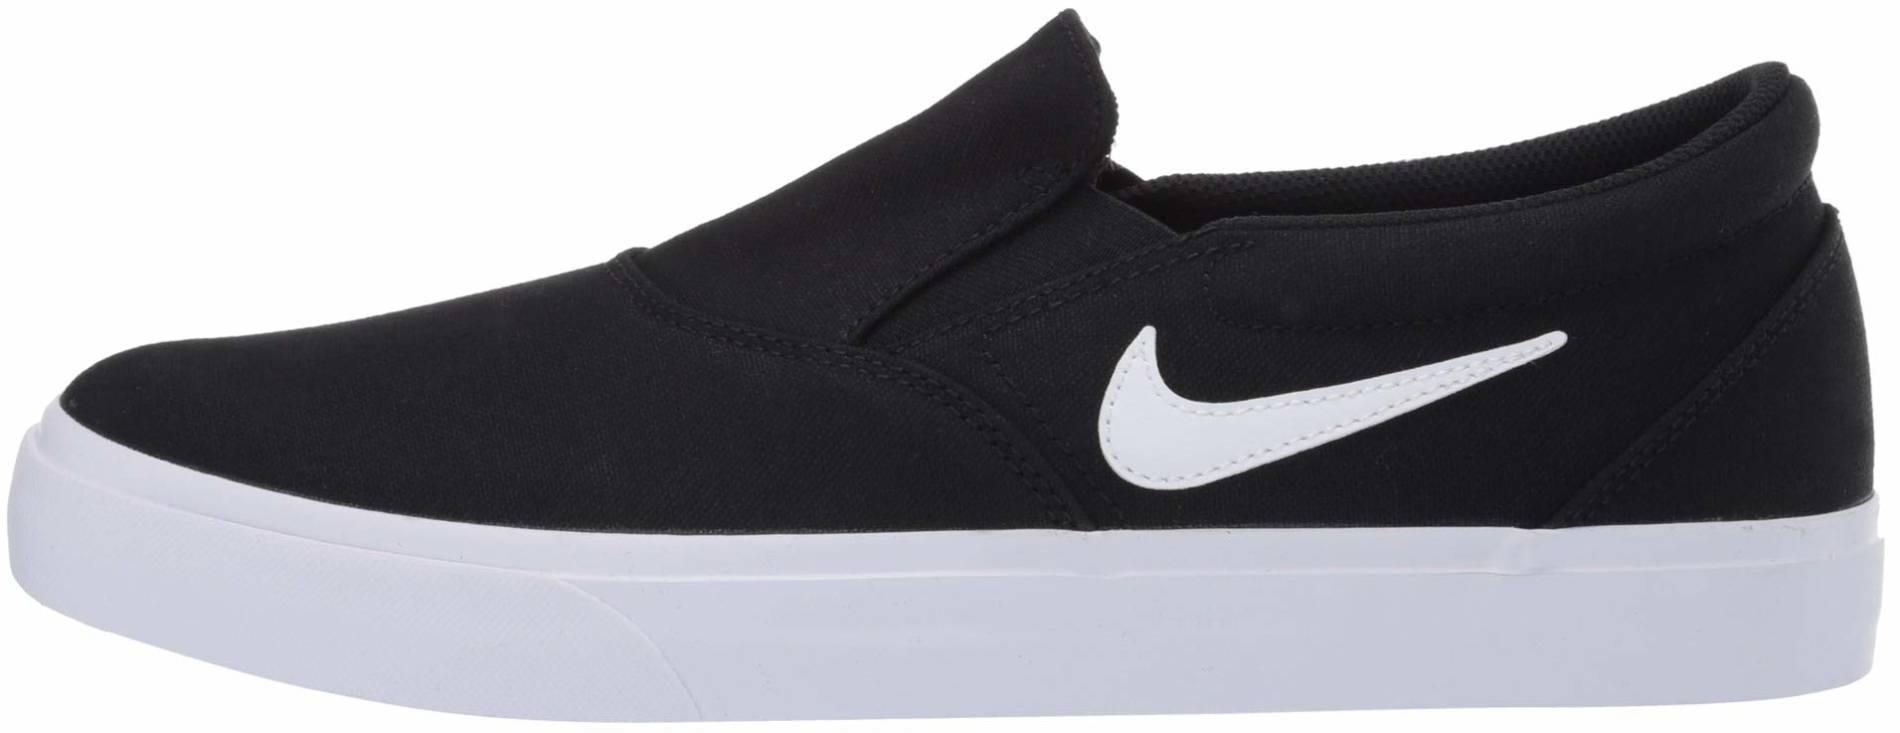 Nike SB Charge Slip sneakers in 6 colors | RunRepeat